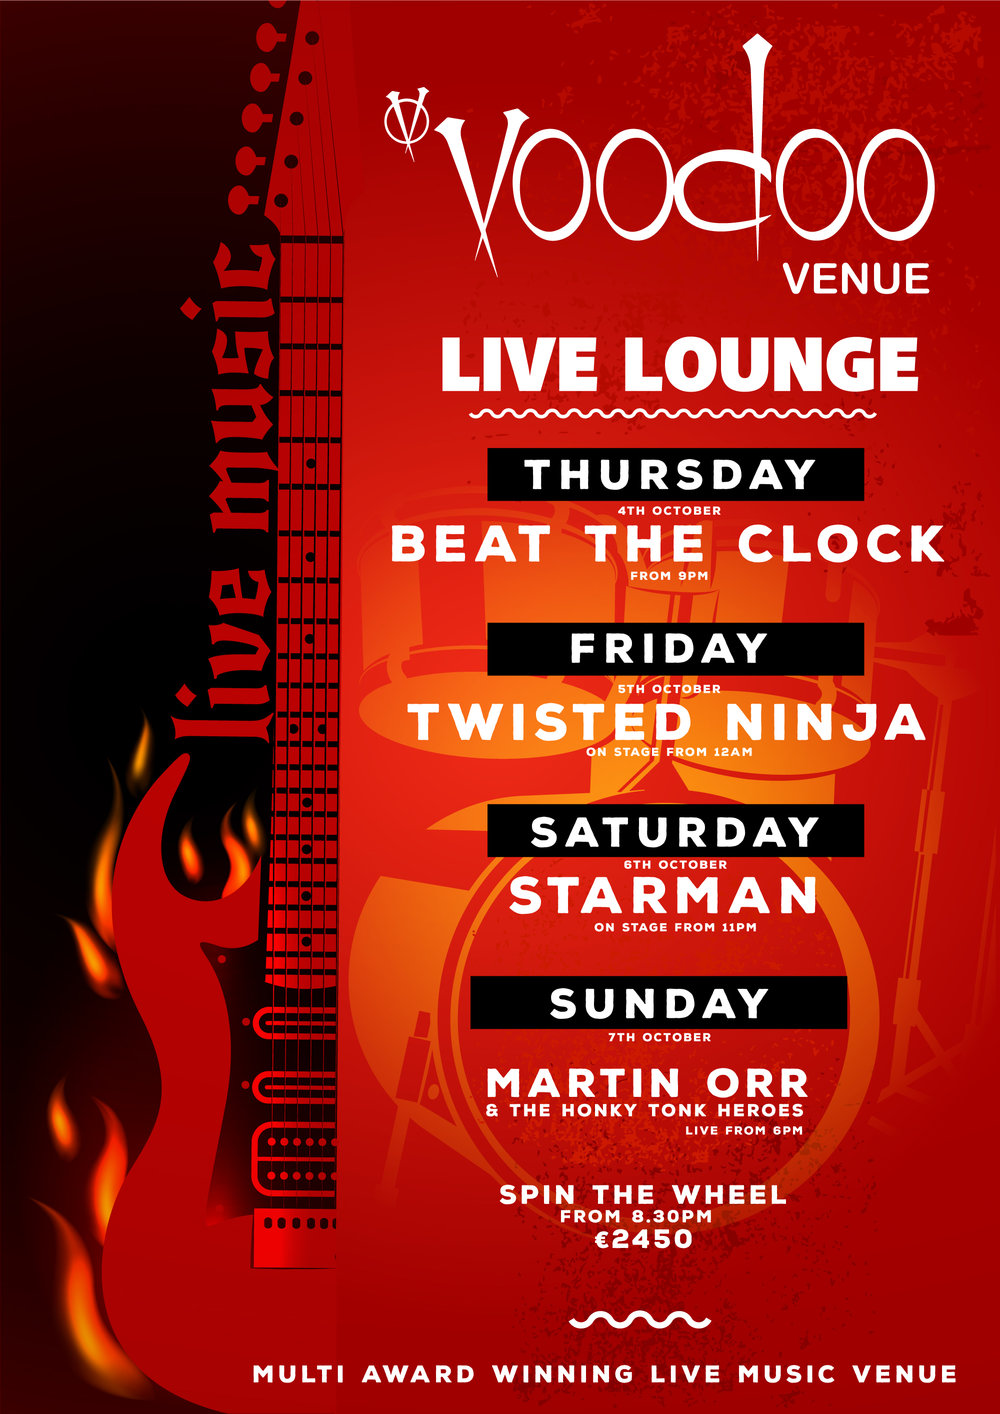 voodoo-venue---live-lounge---thurs-4-oct---7-2018-V2.jpg